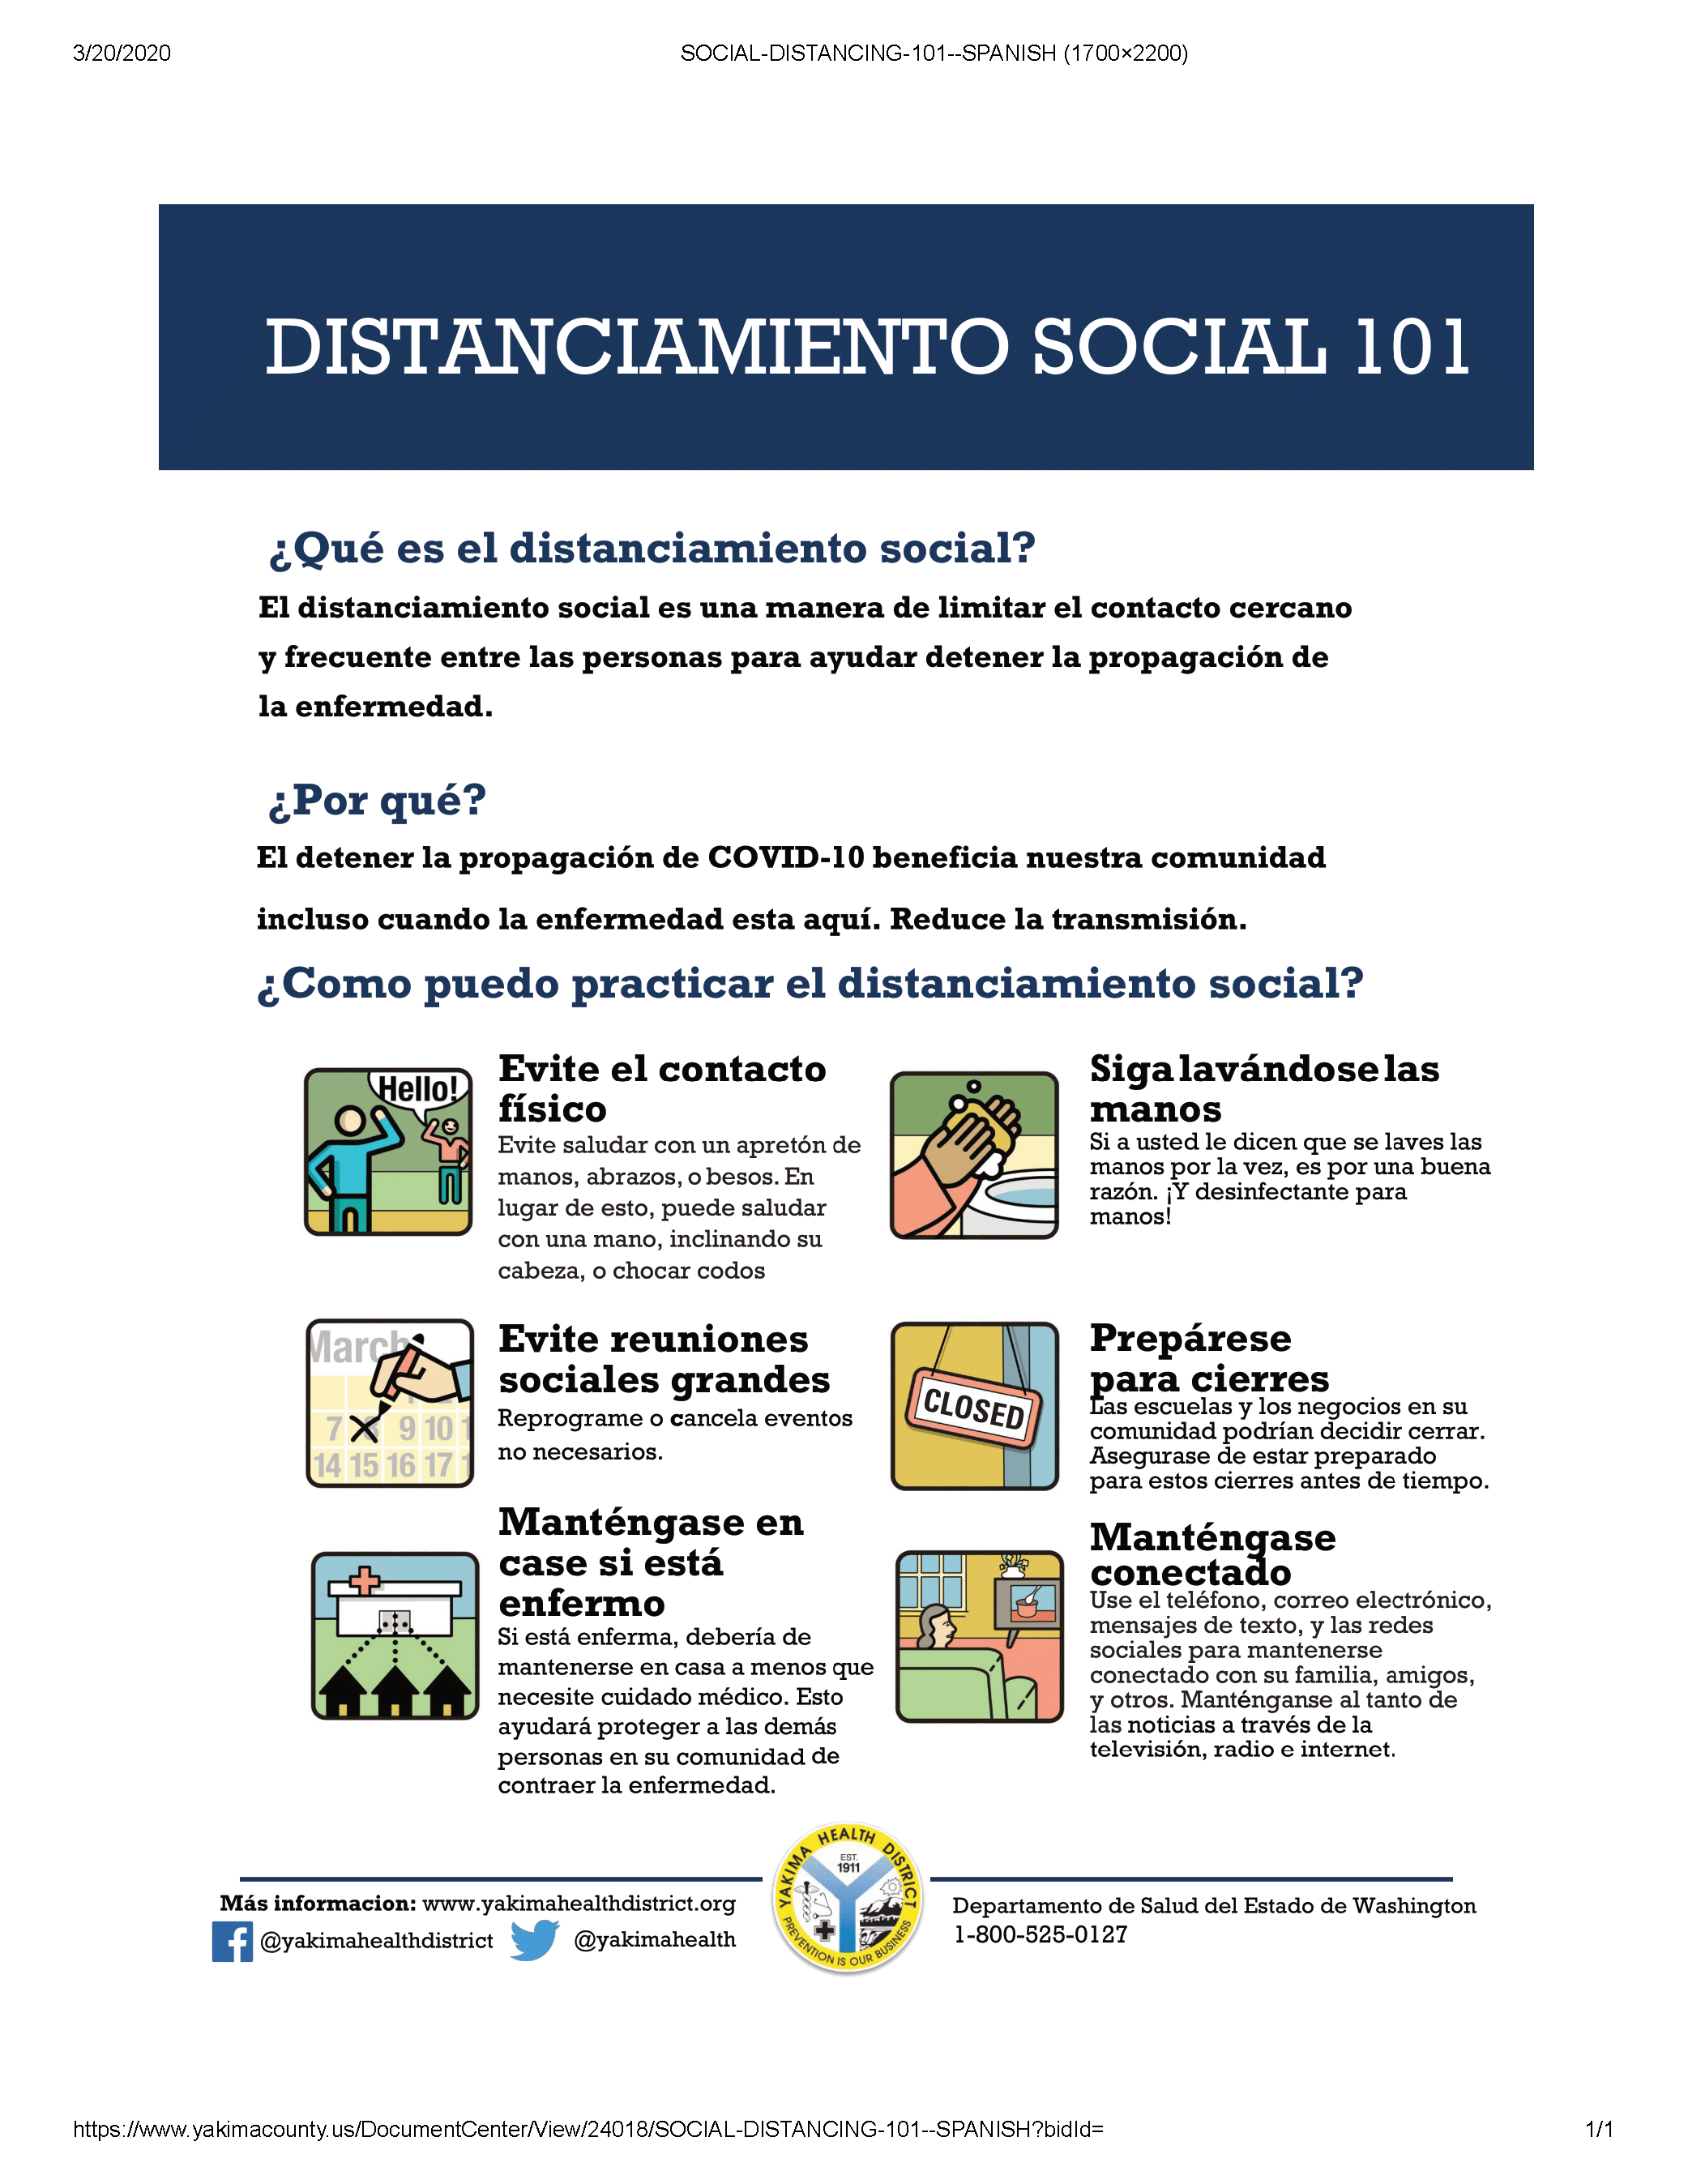 Social Distancing 101 Spanish